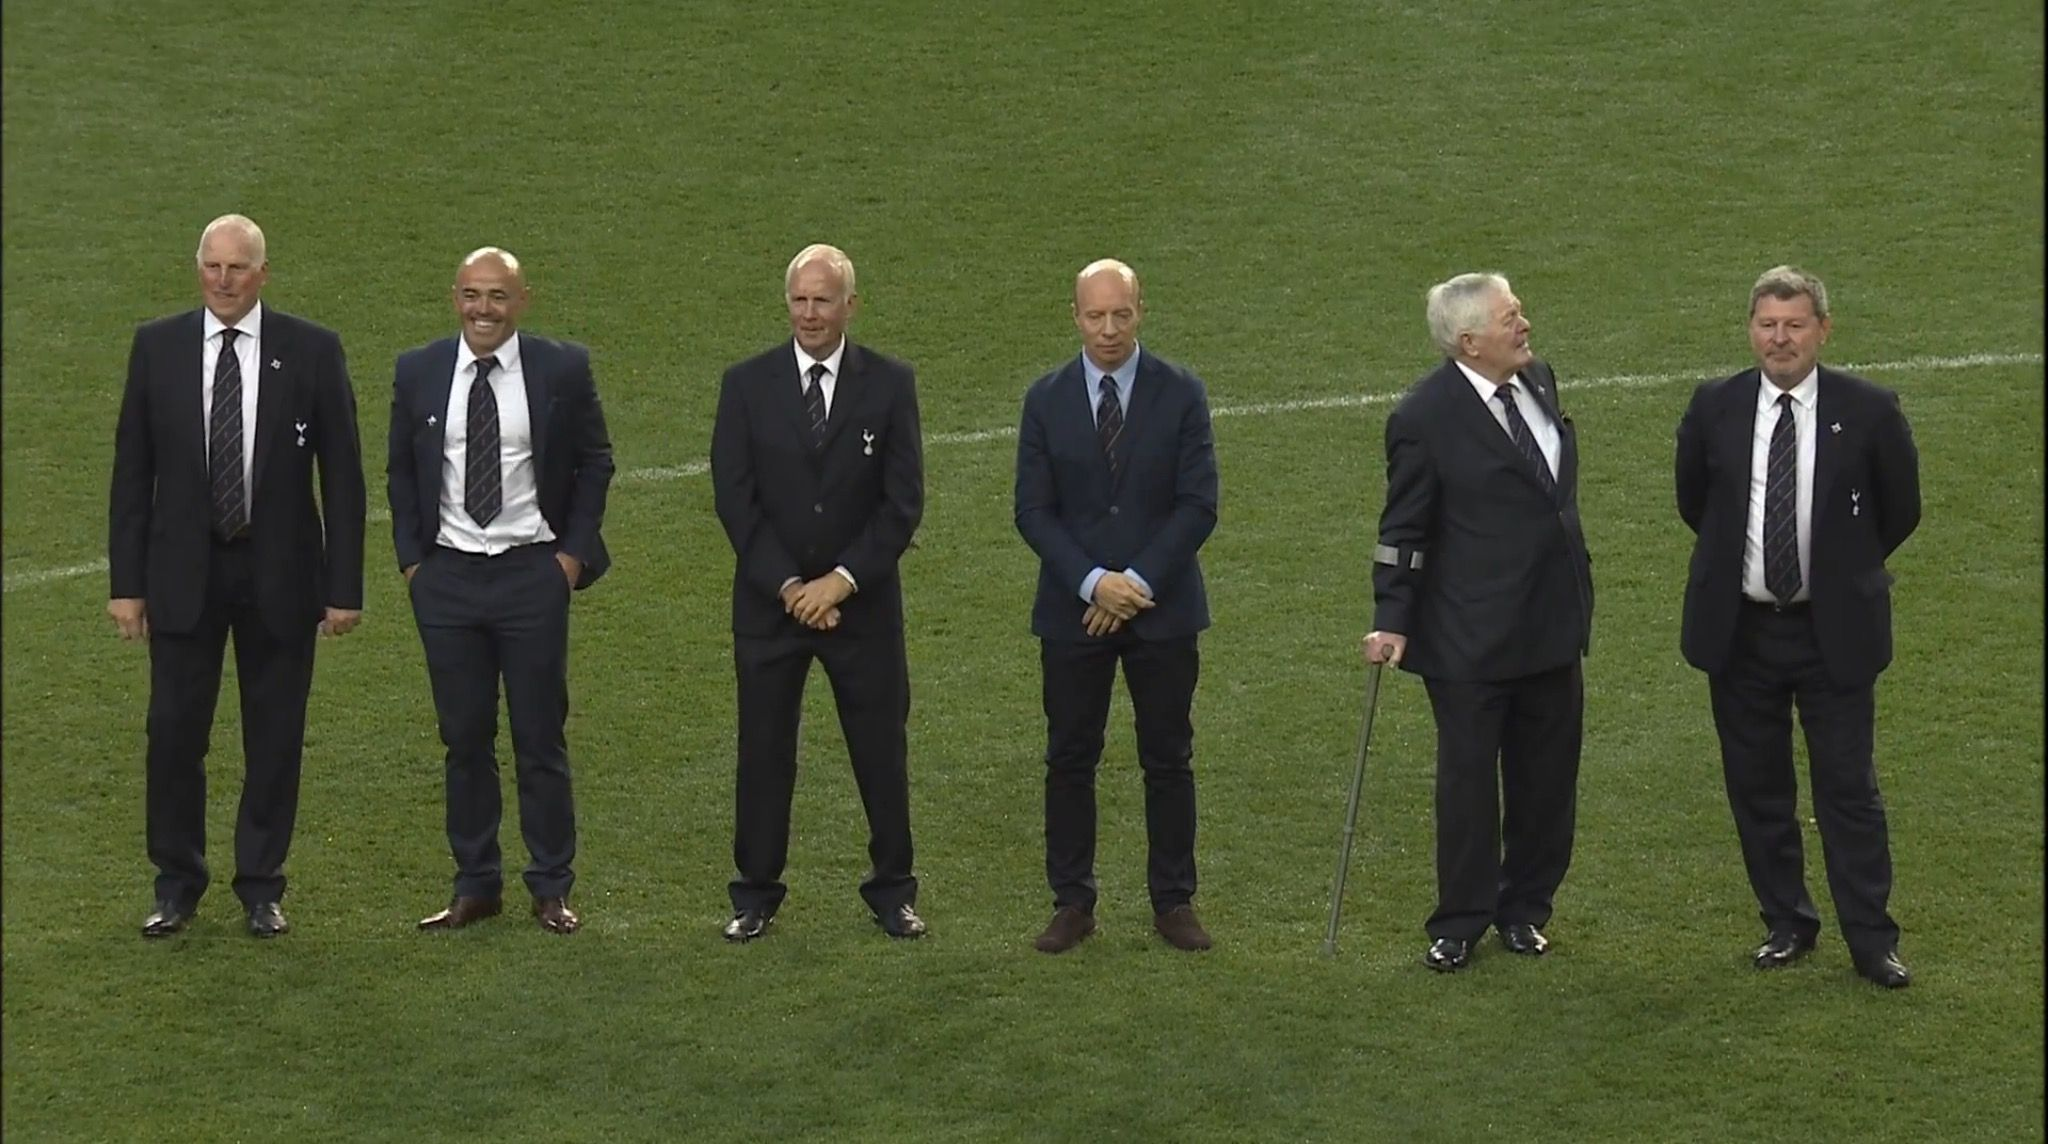 Ray Clemence, Steven Carr, Phil Beal, Steve Archibald, Les ...